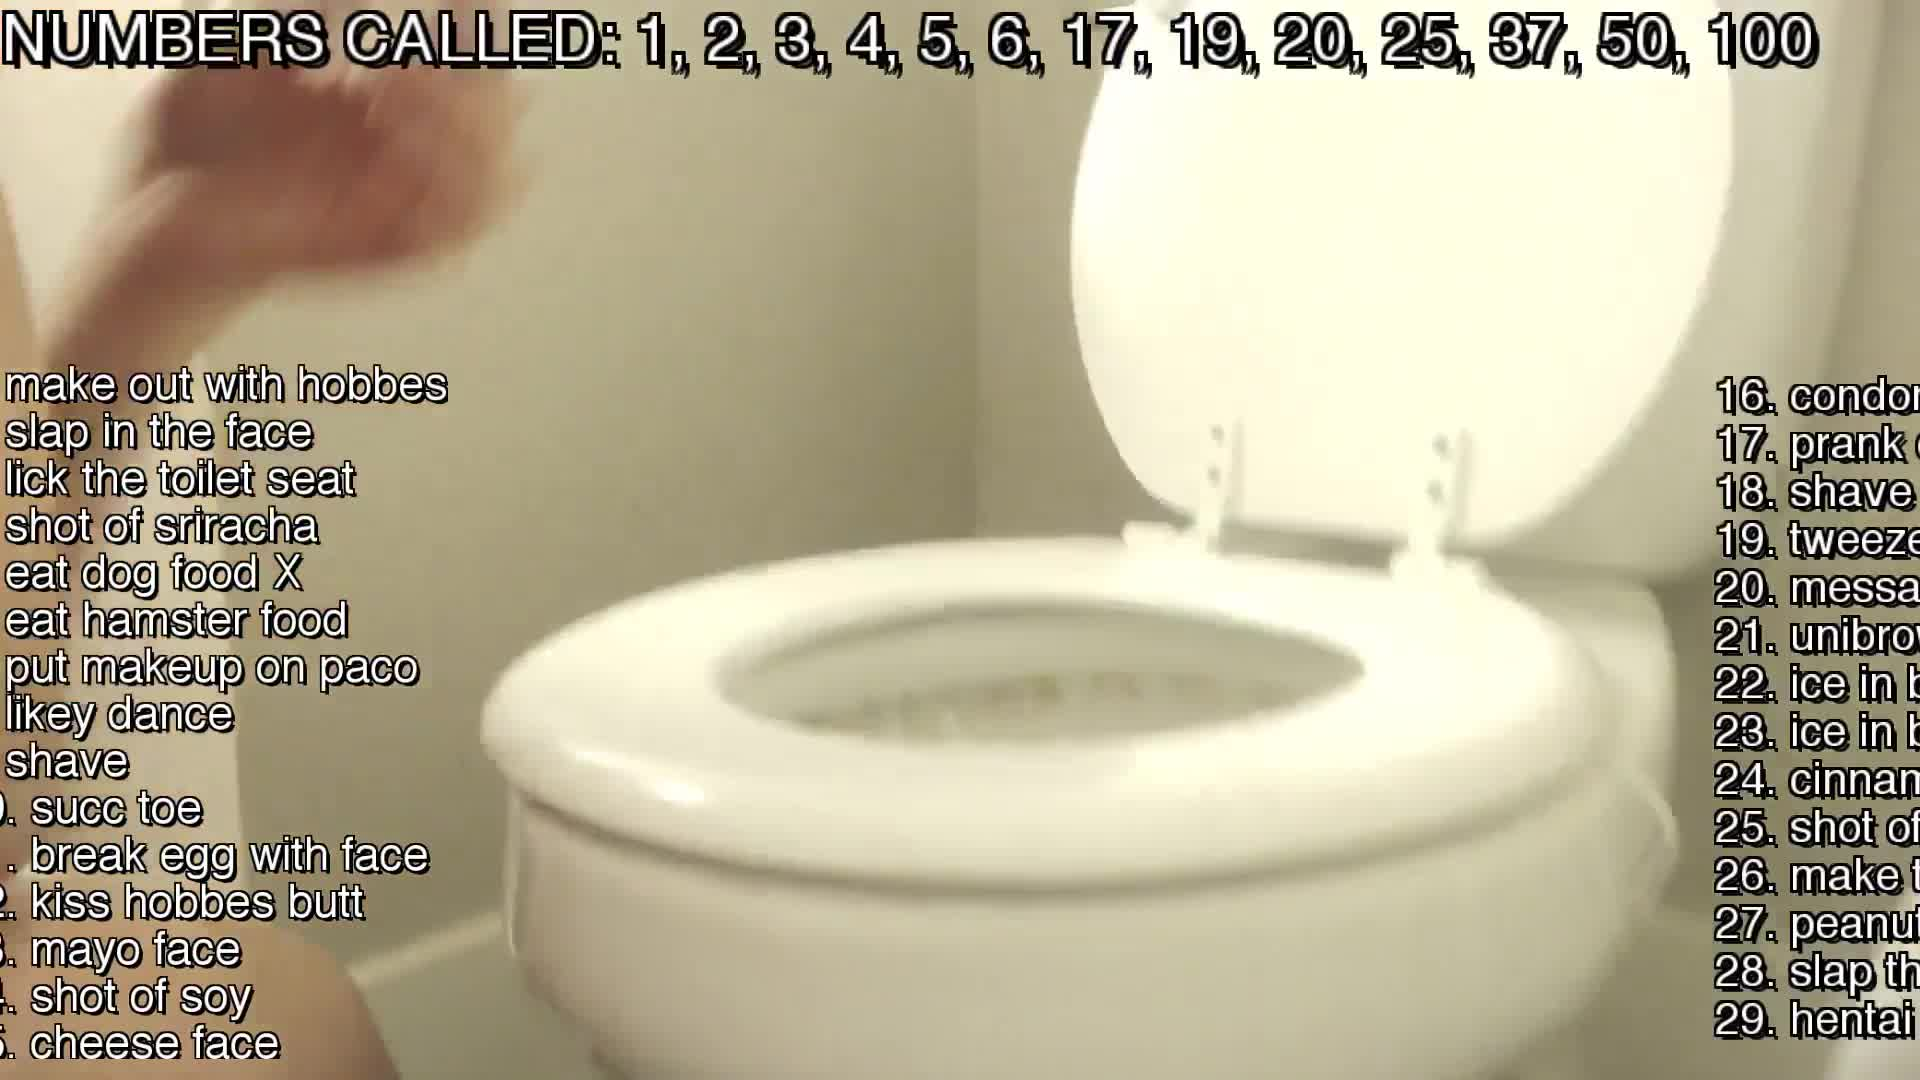 Quite suggest Lick toilet seat